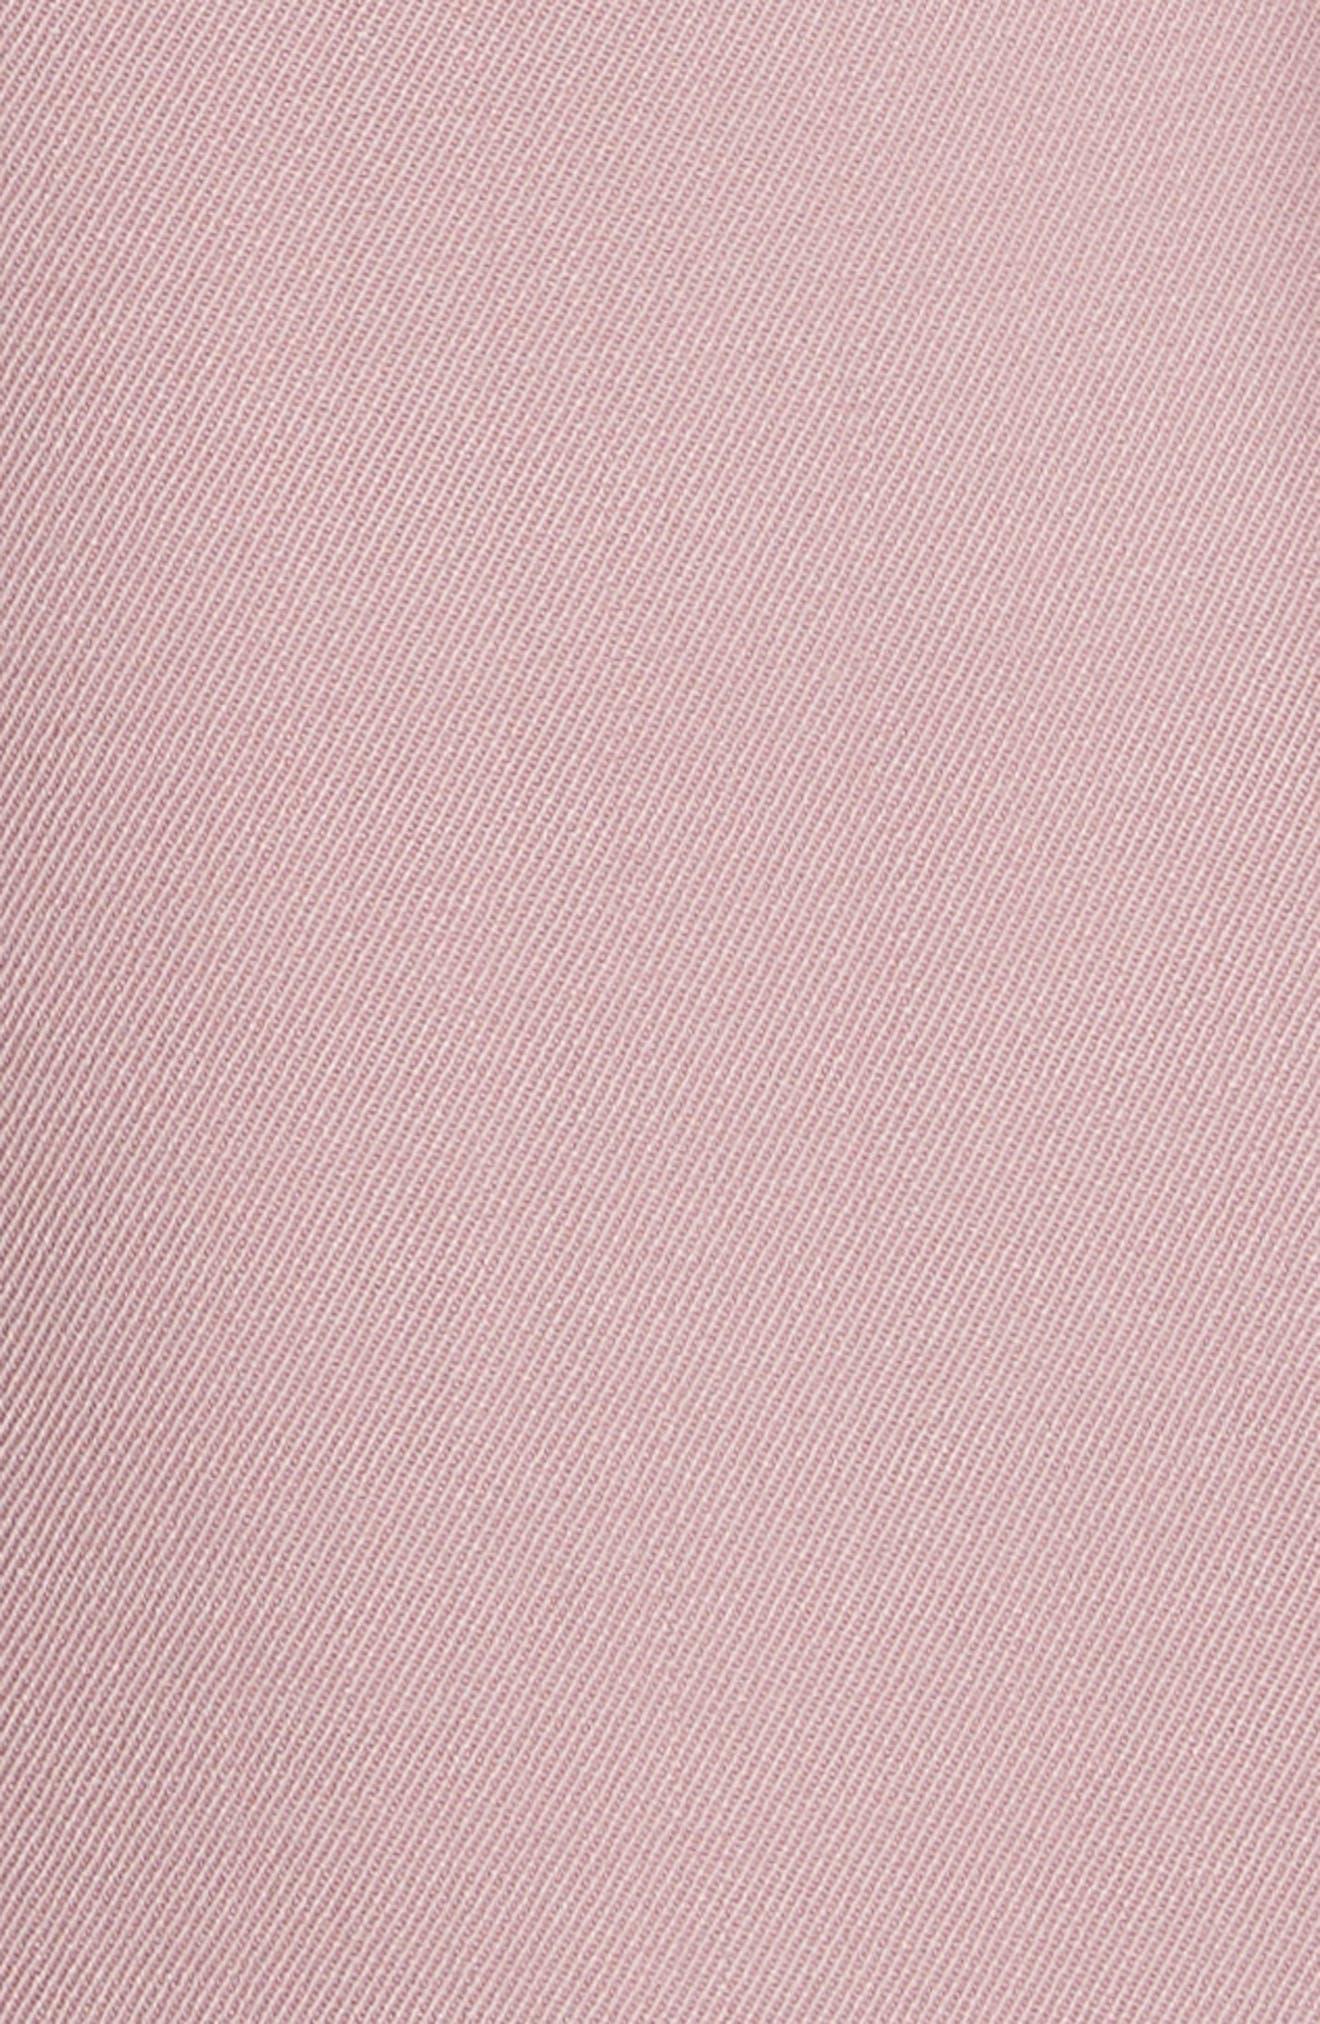 Ruffle Trim Jacket,                             Alternate thumbnail 6, color,                             Dusty Rose